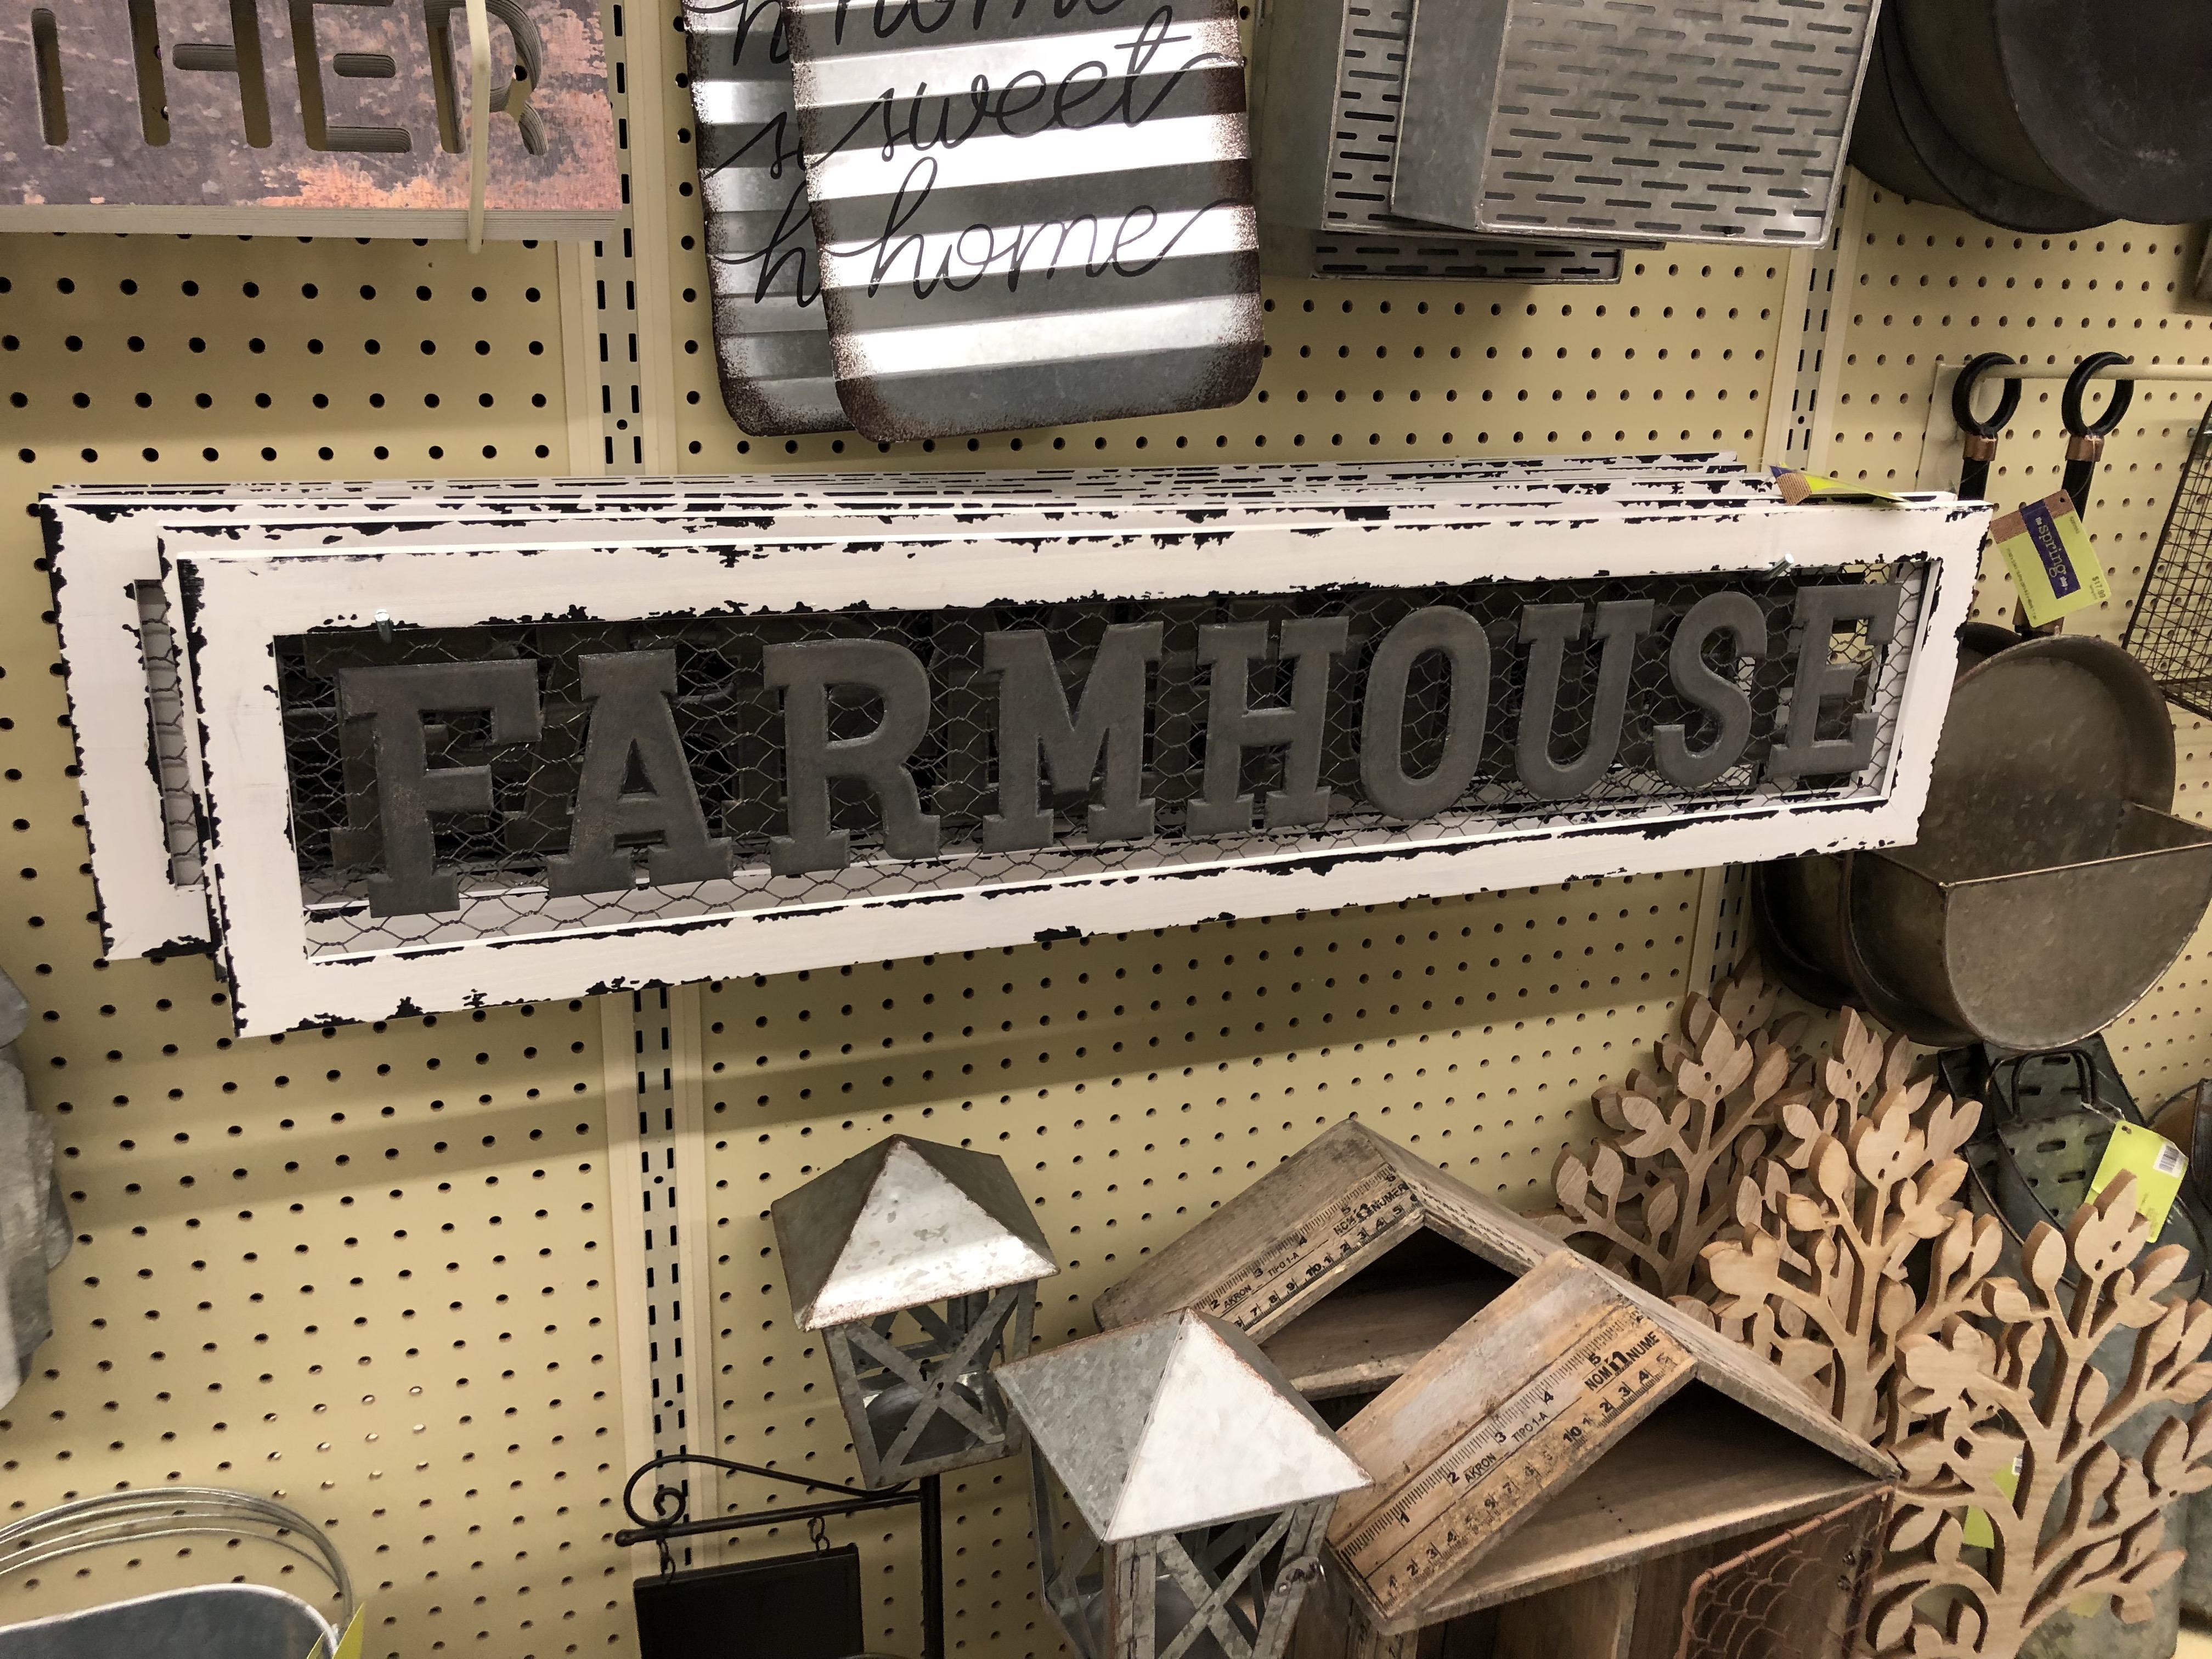 Farmhouse Wall Decor Starting At $4.79 At Hobby Lobby